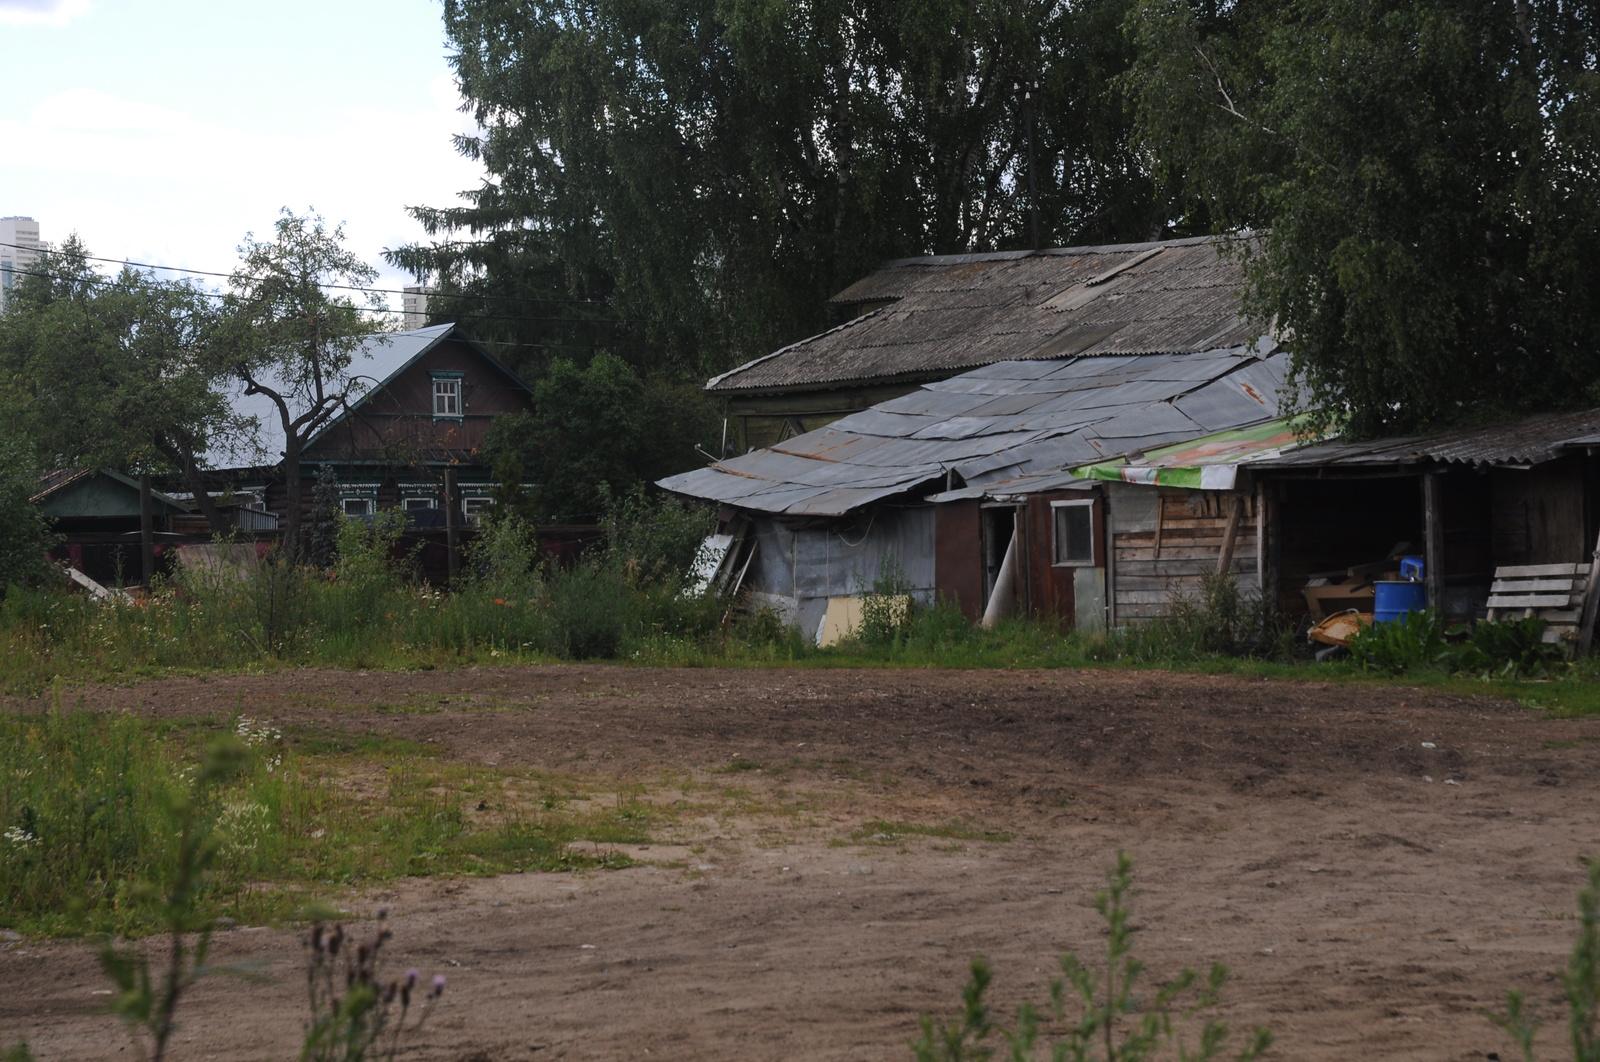 Деревня казино далеко от нахабино чат рулетка для девушек онлайн бесплатно